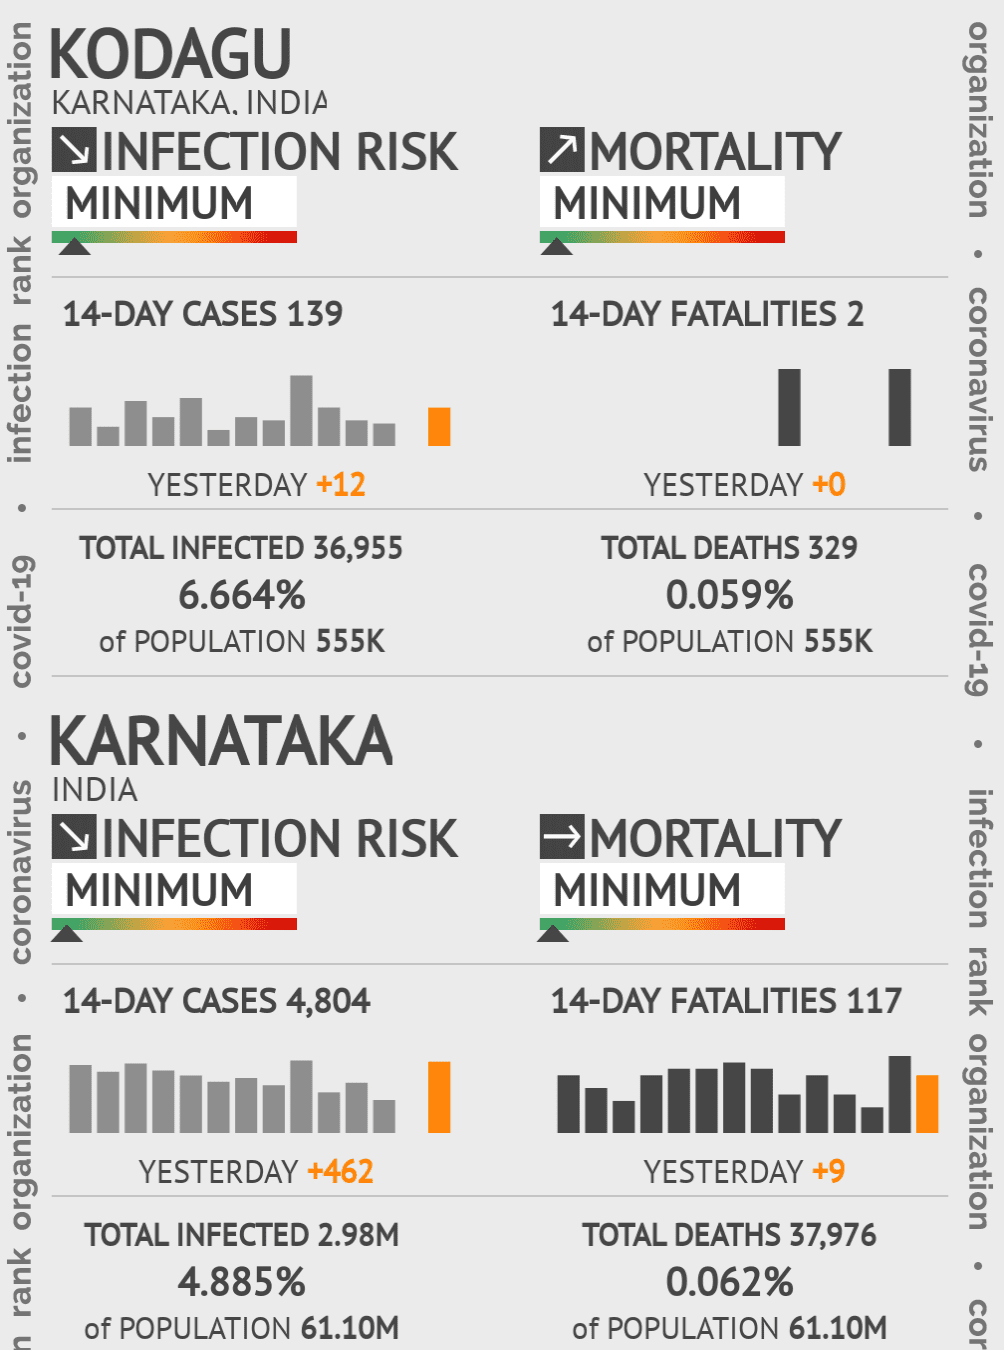 Kodagu Coronavirus Covid-19 Risk of Infection on March 07, 2021